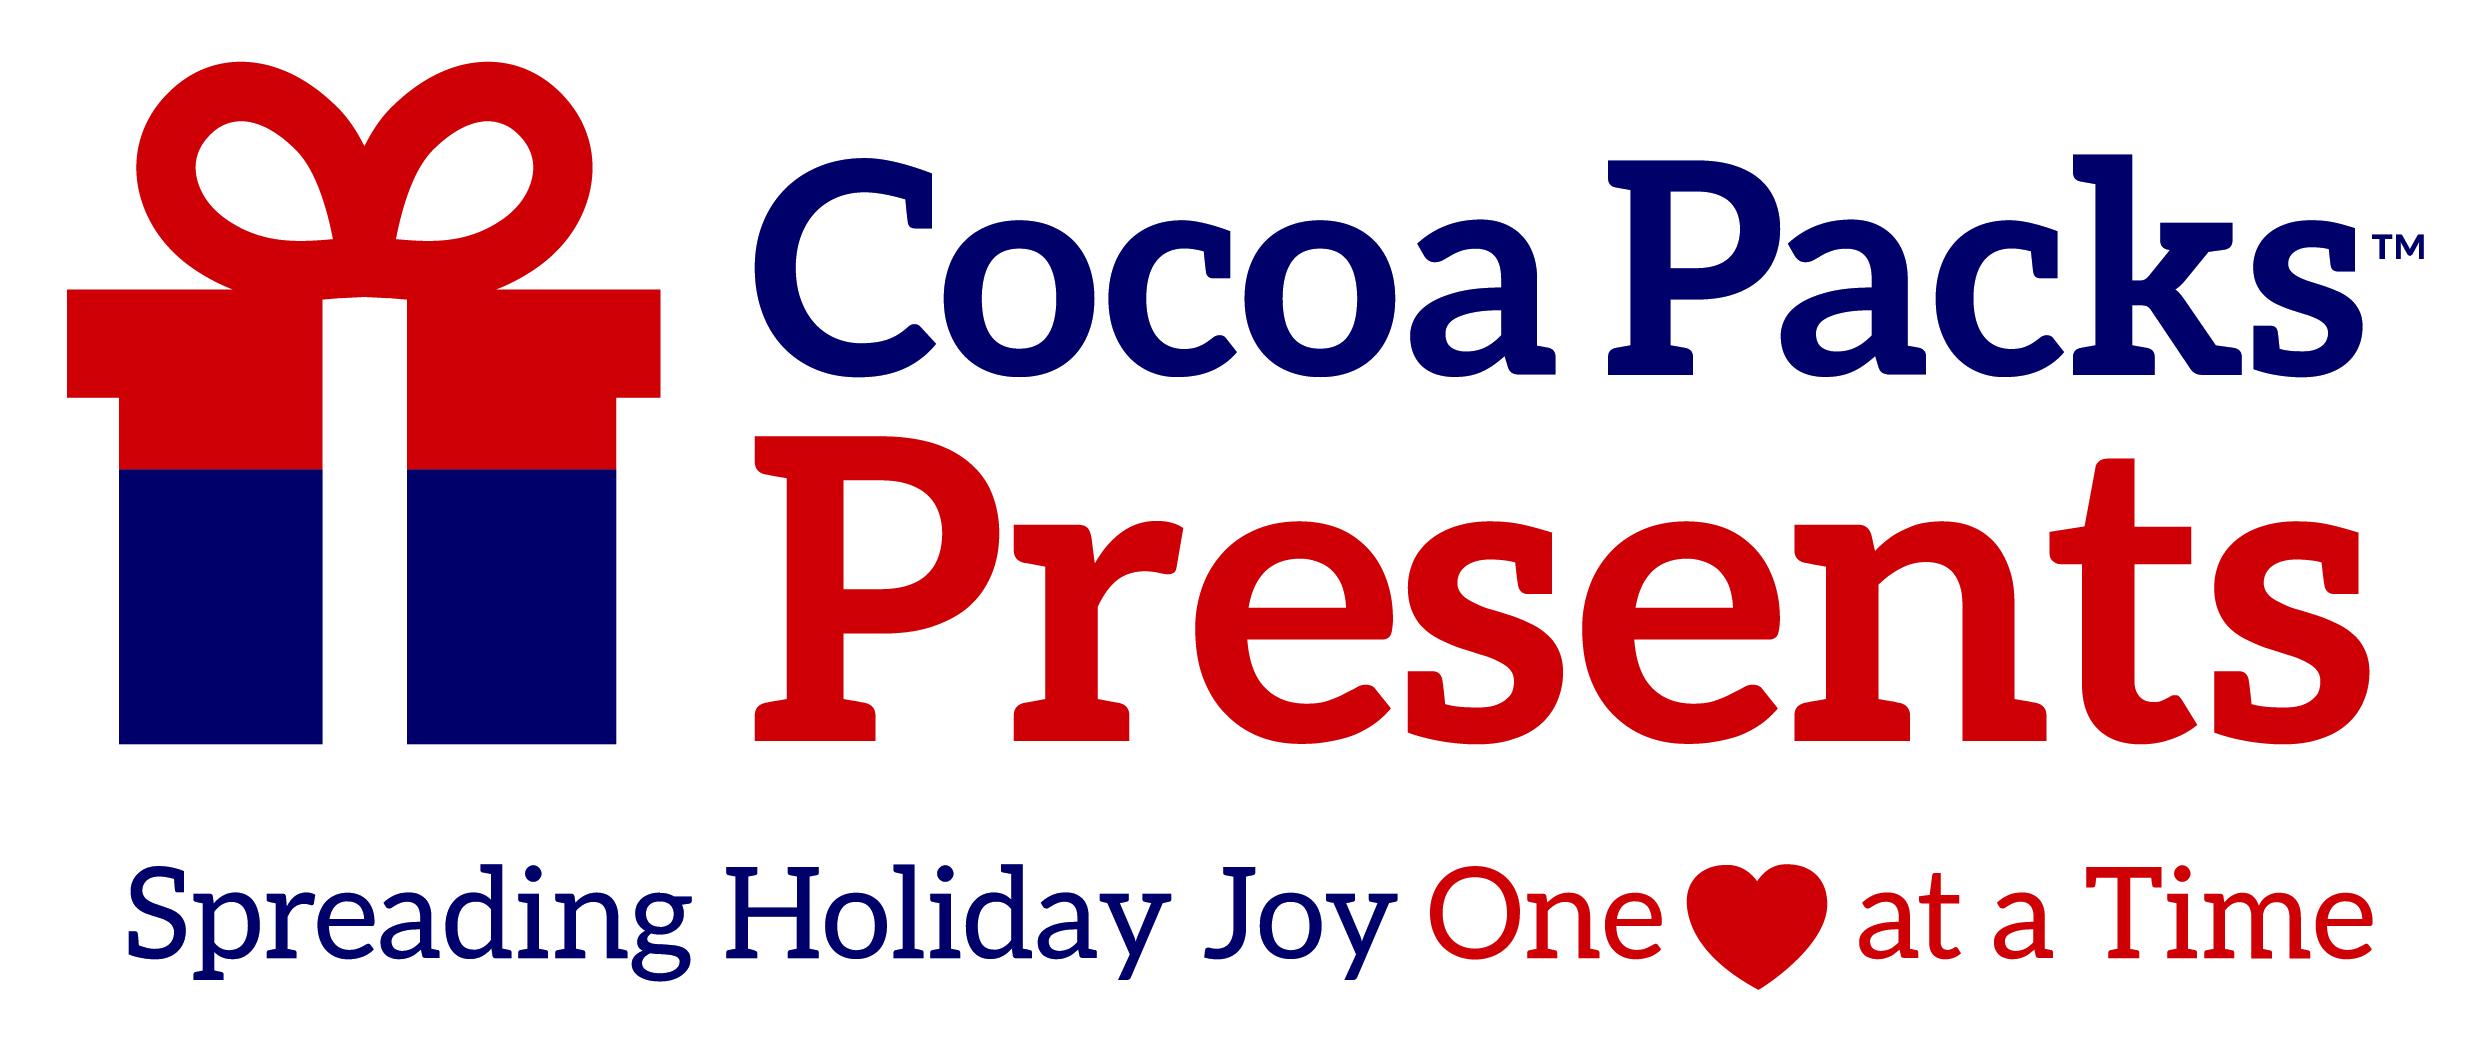 Cocoa Parks Presents_logo_FINAL-01.jpg